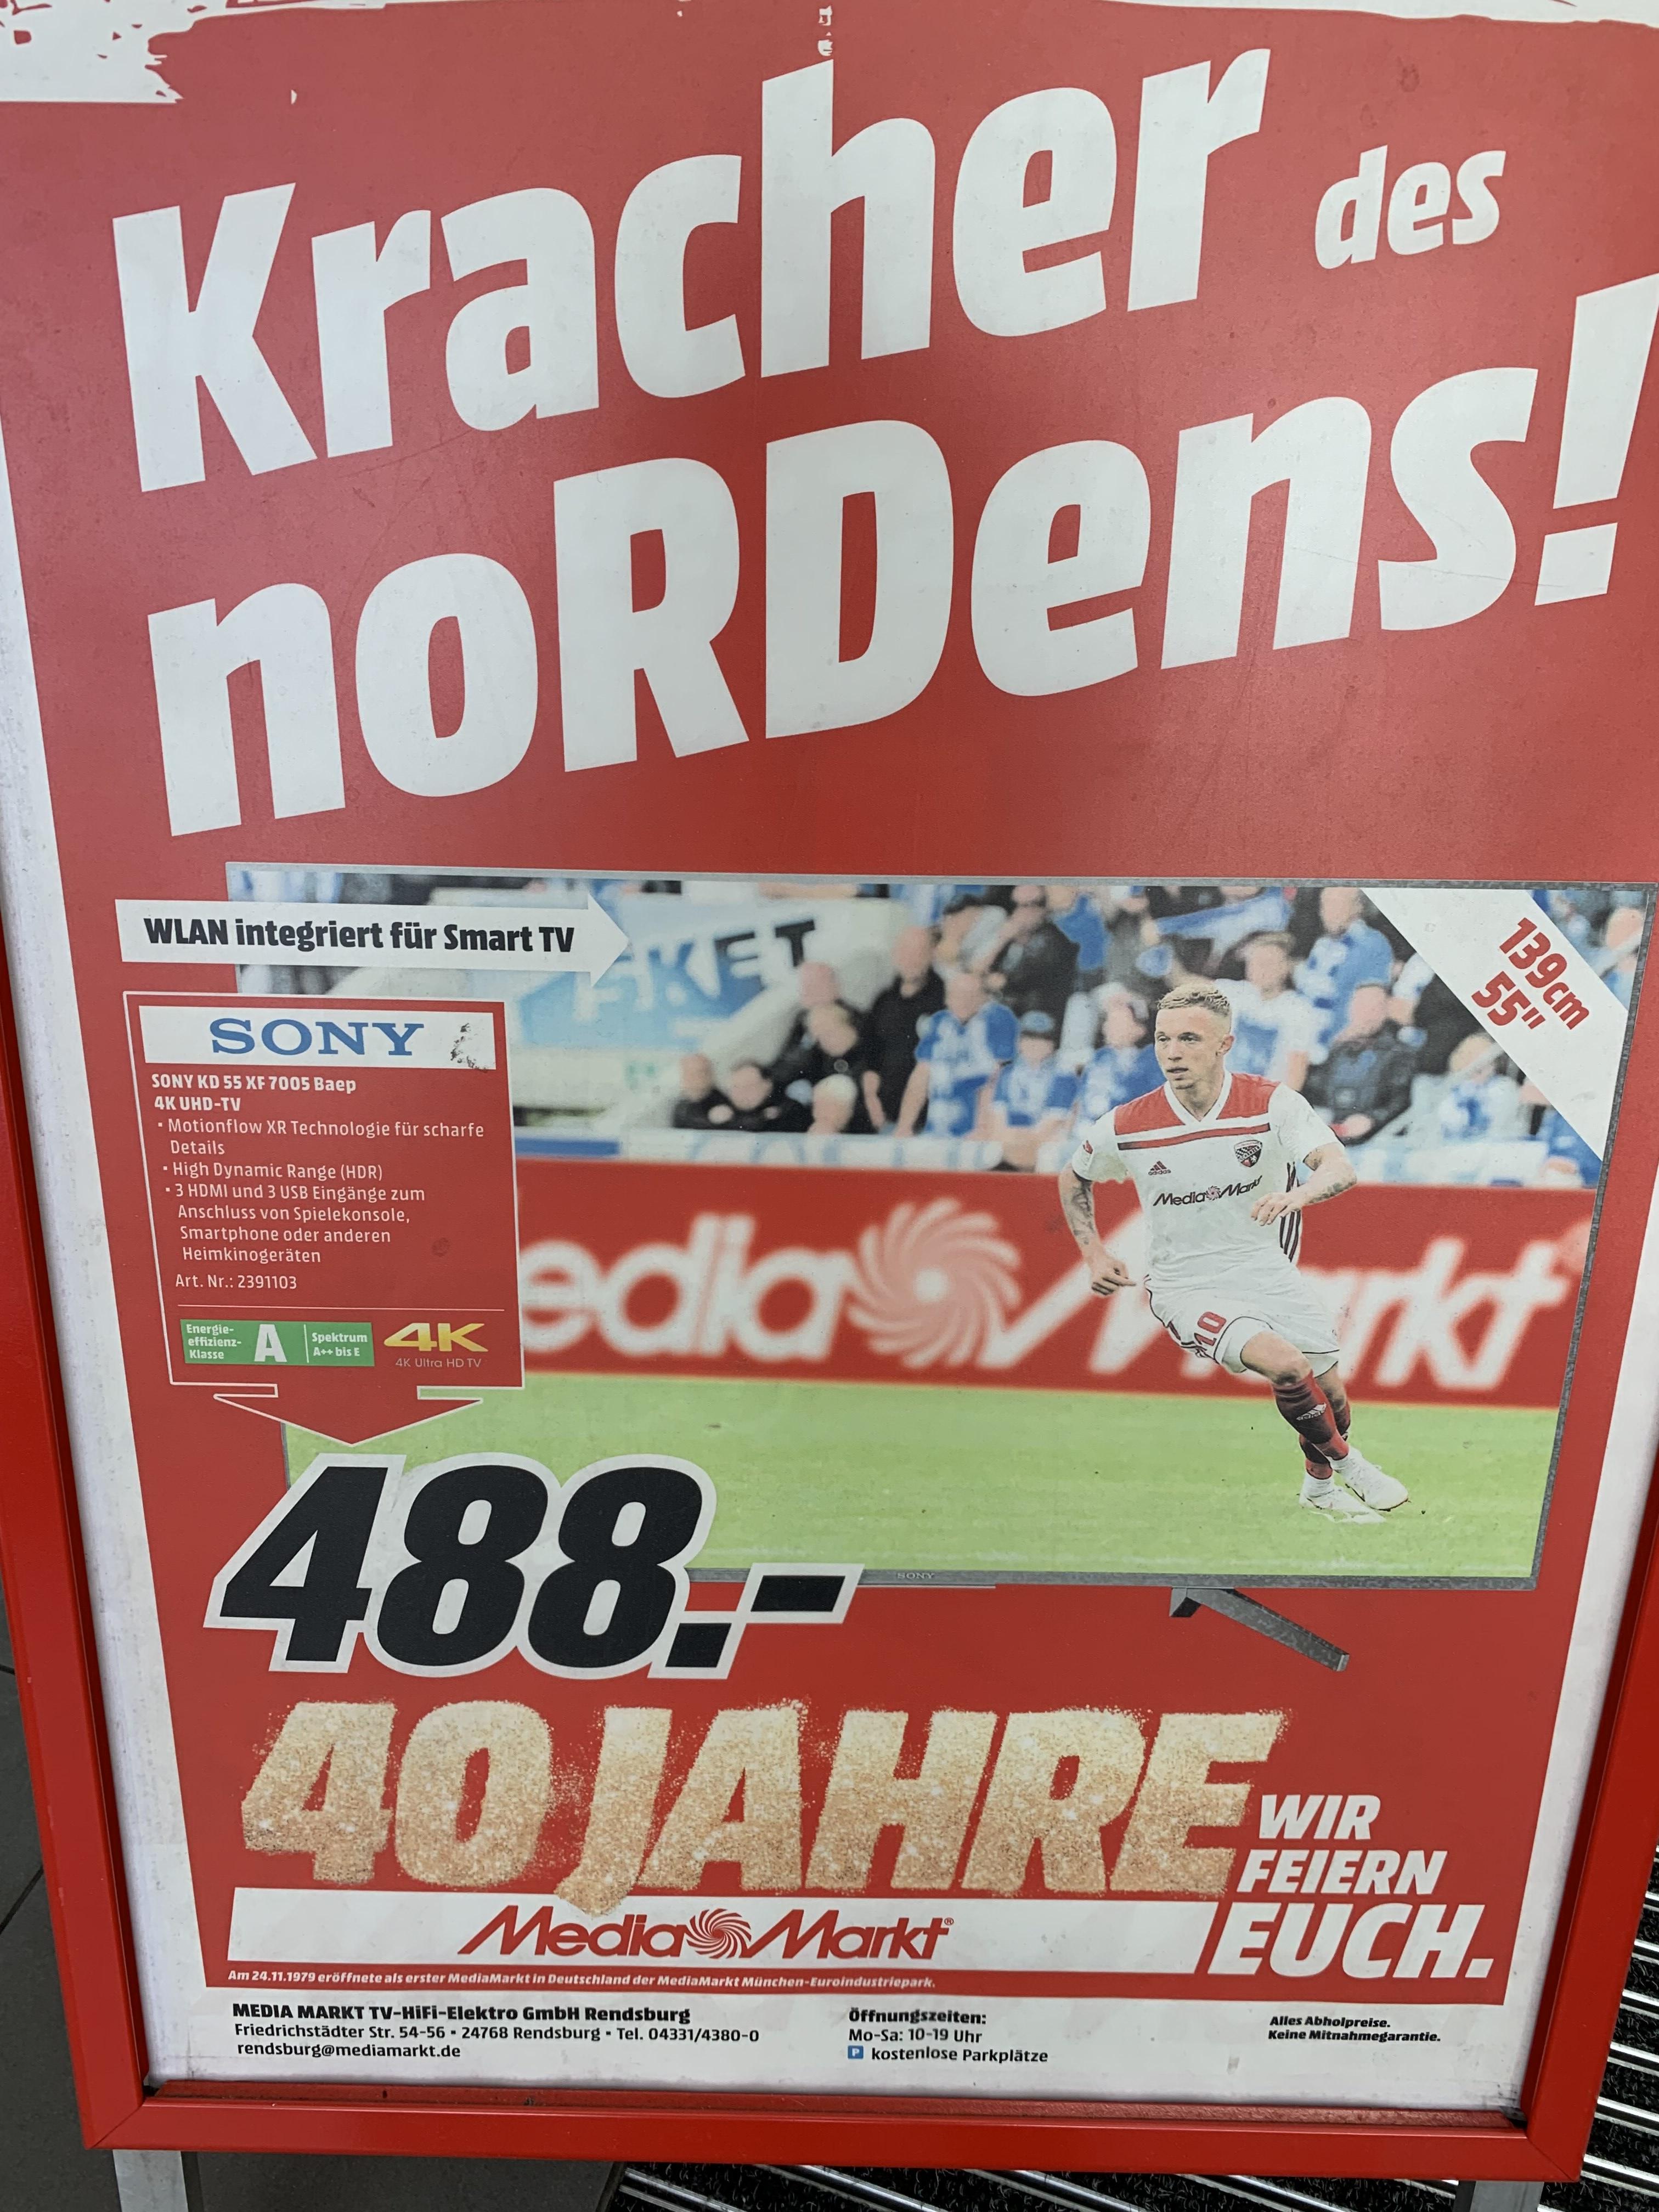 Sony KD 55 XF 7005 4K Fernseher im Media Markt Rendsburg